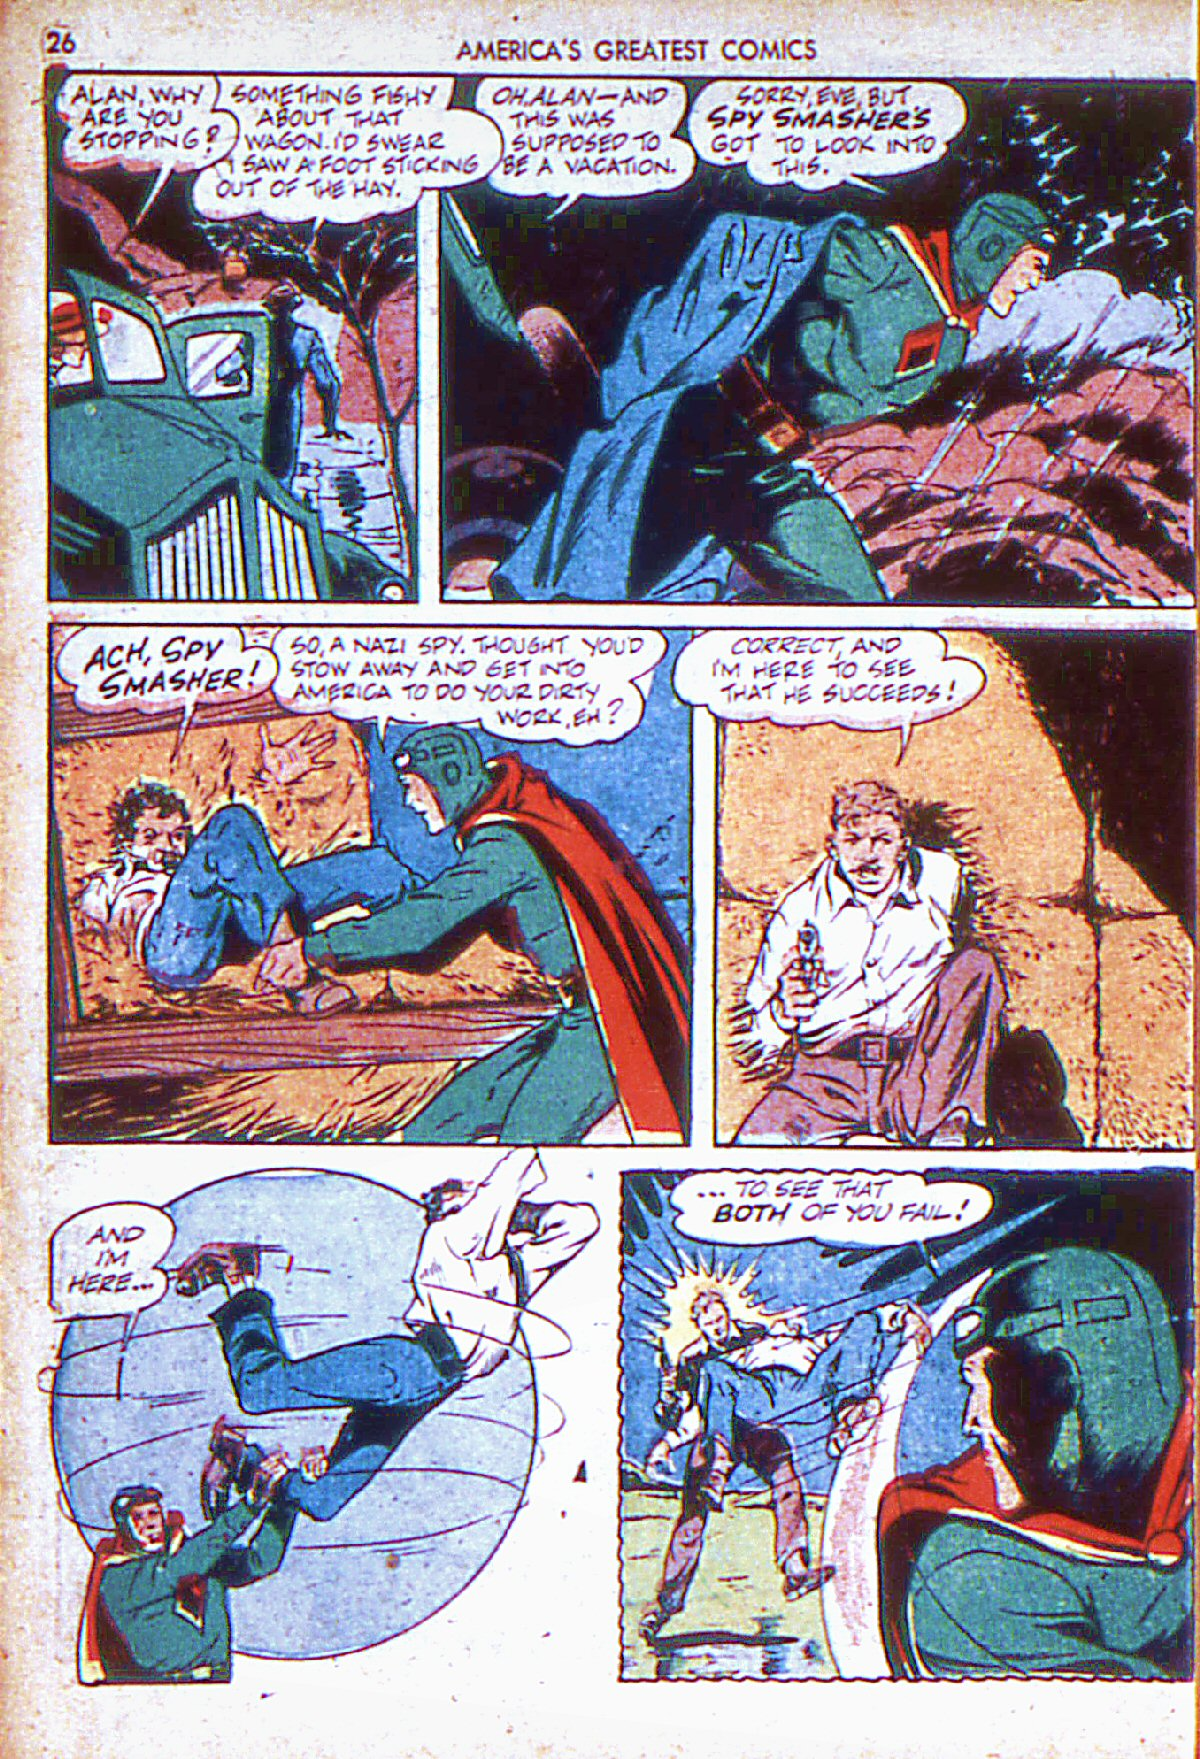 Read online America's Greatest Comics comic -  Issue #6 - 27